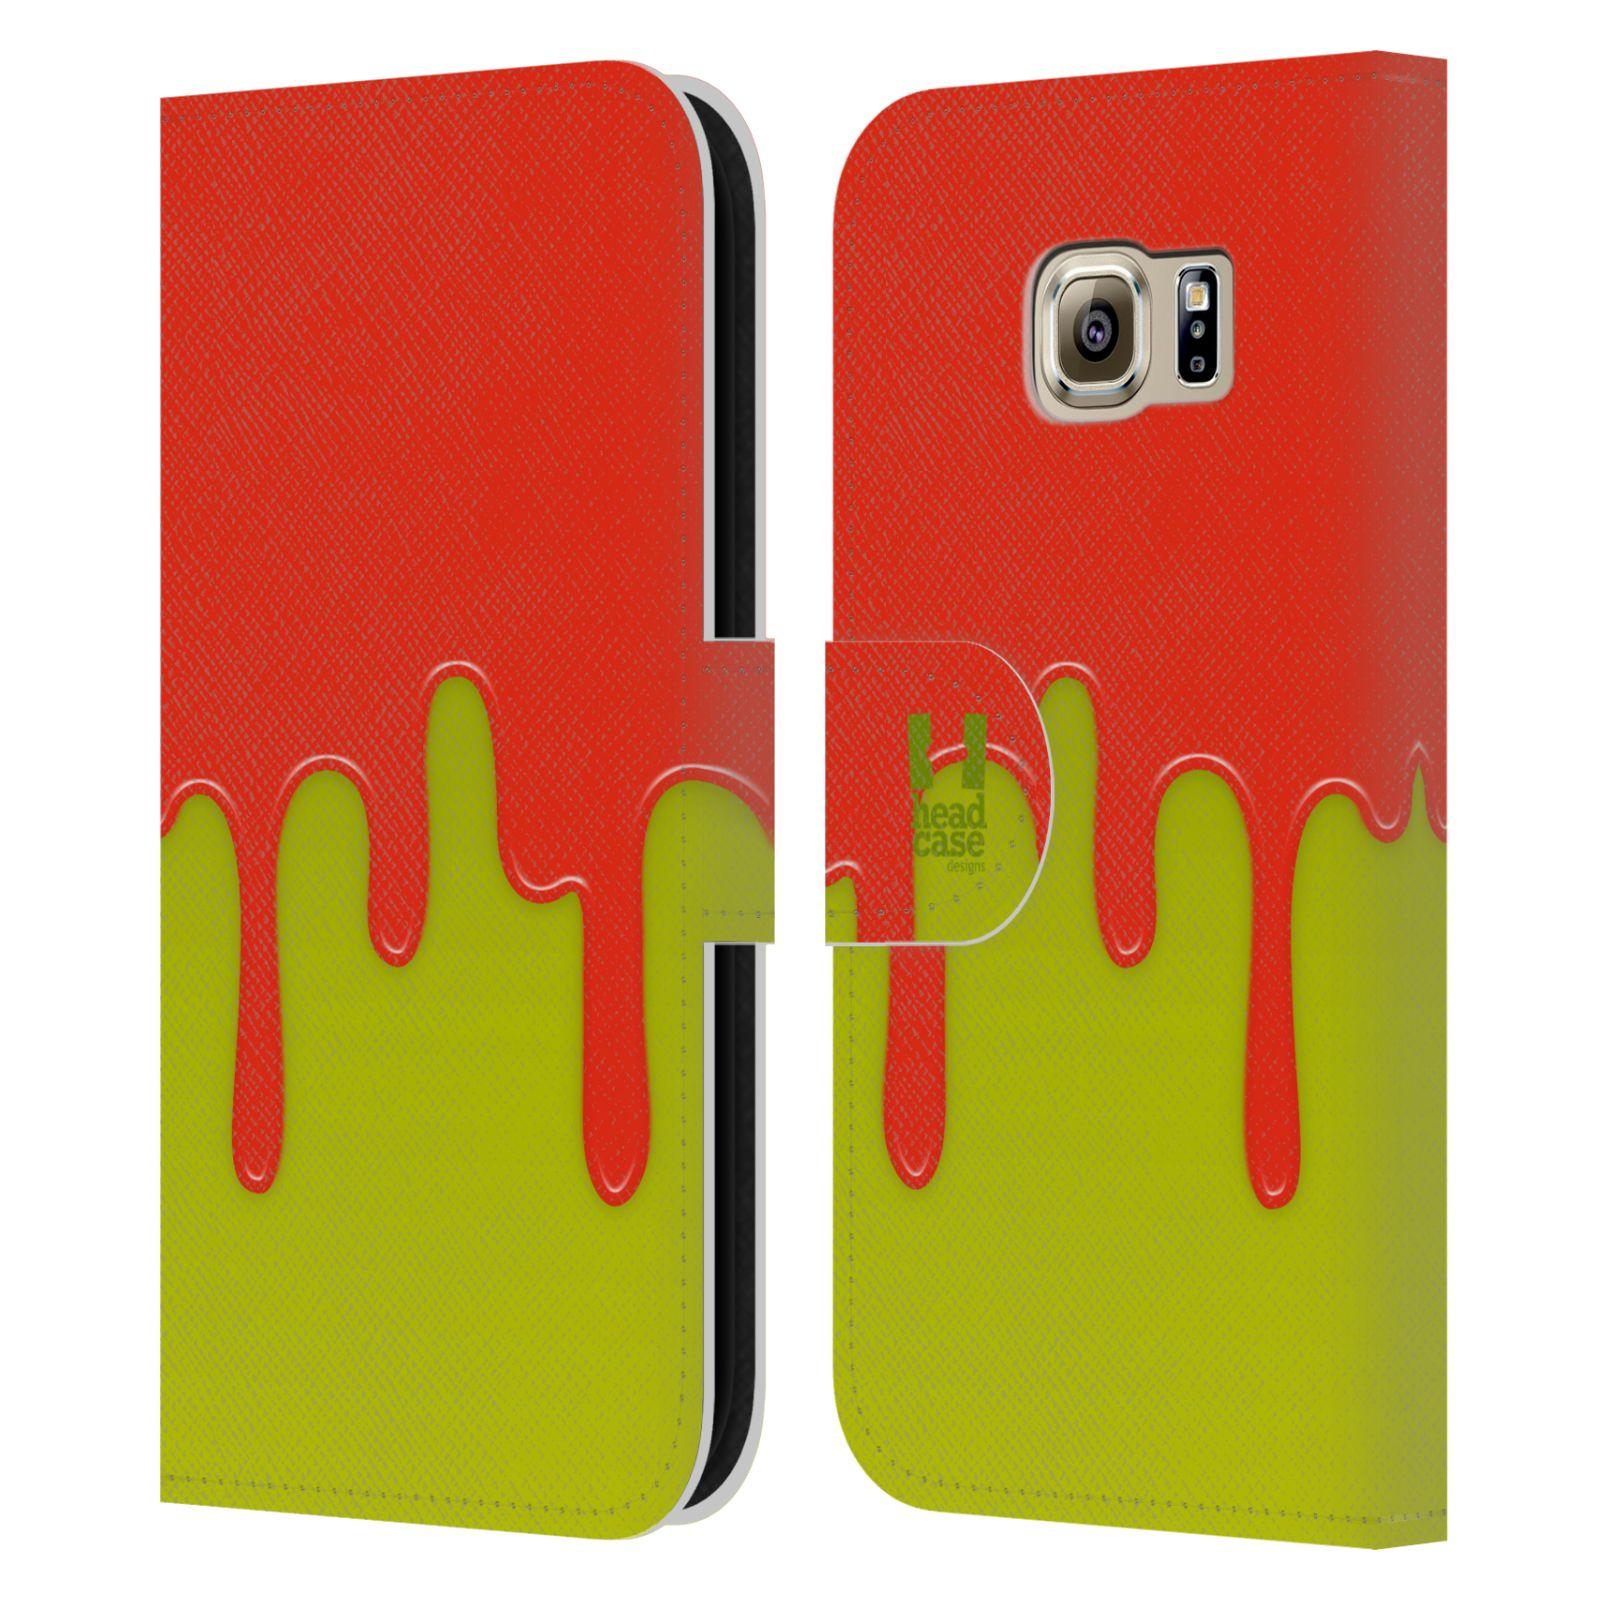 HEAD CASE Flipové pouzdro pro mobil Samsung Galaxy S6 (G9200) Rozlitá barva oranžová a zelená